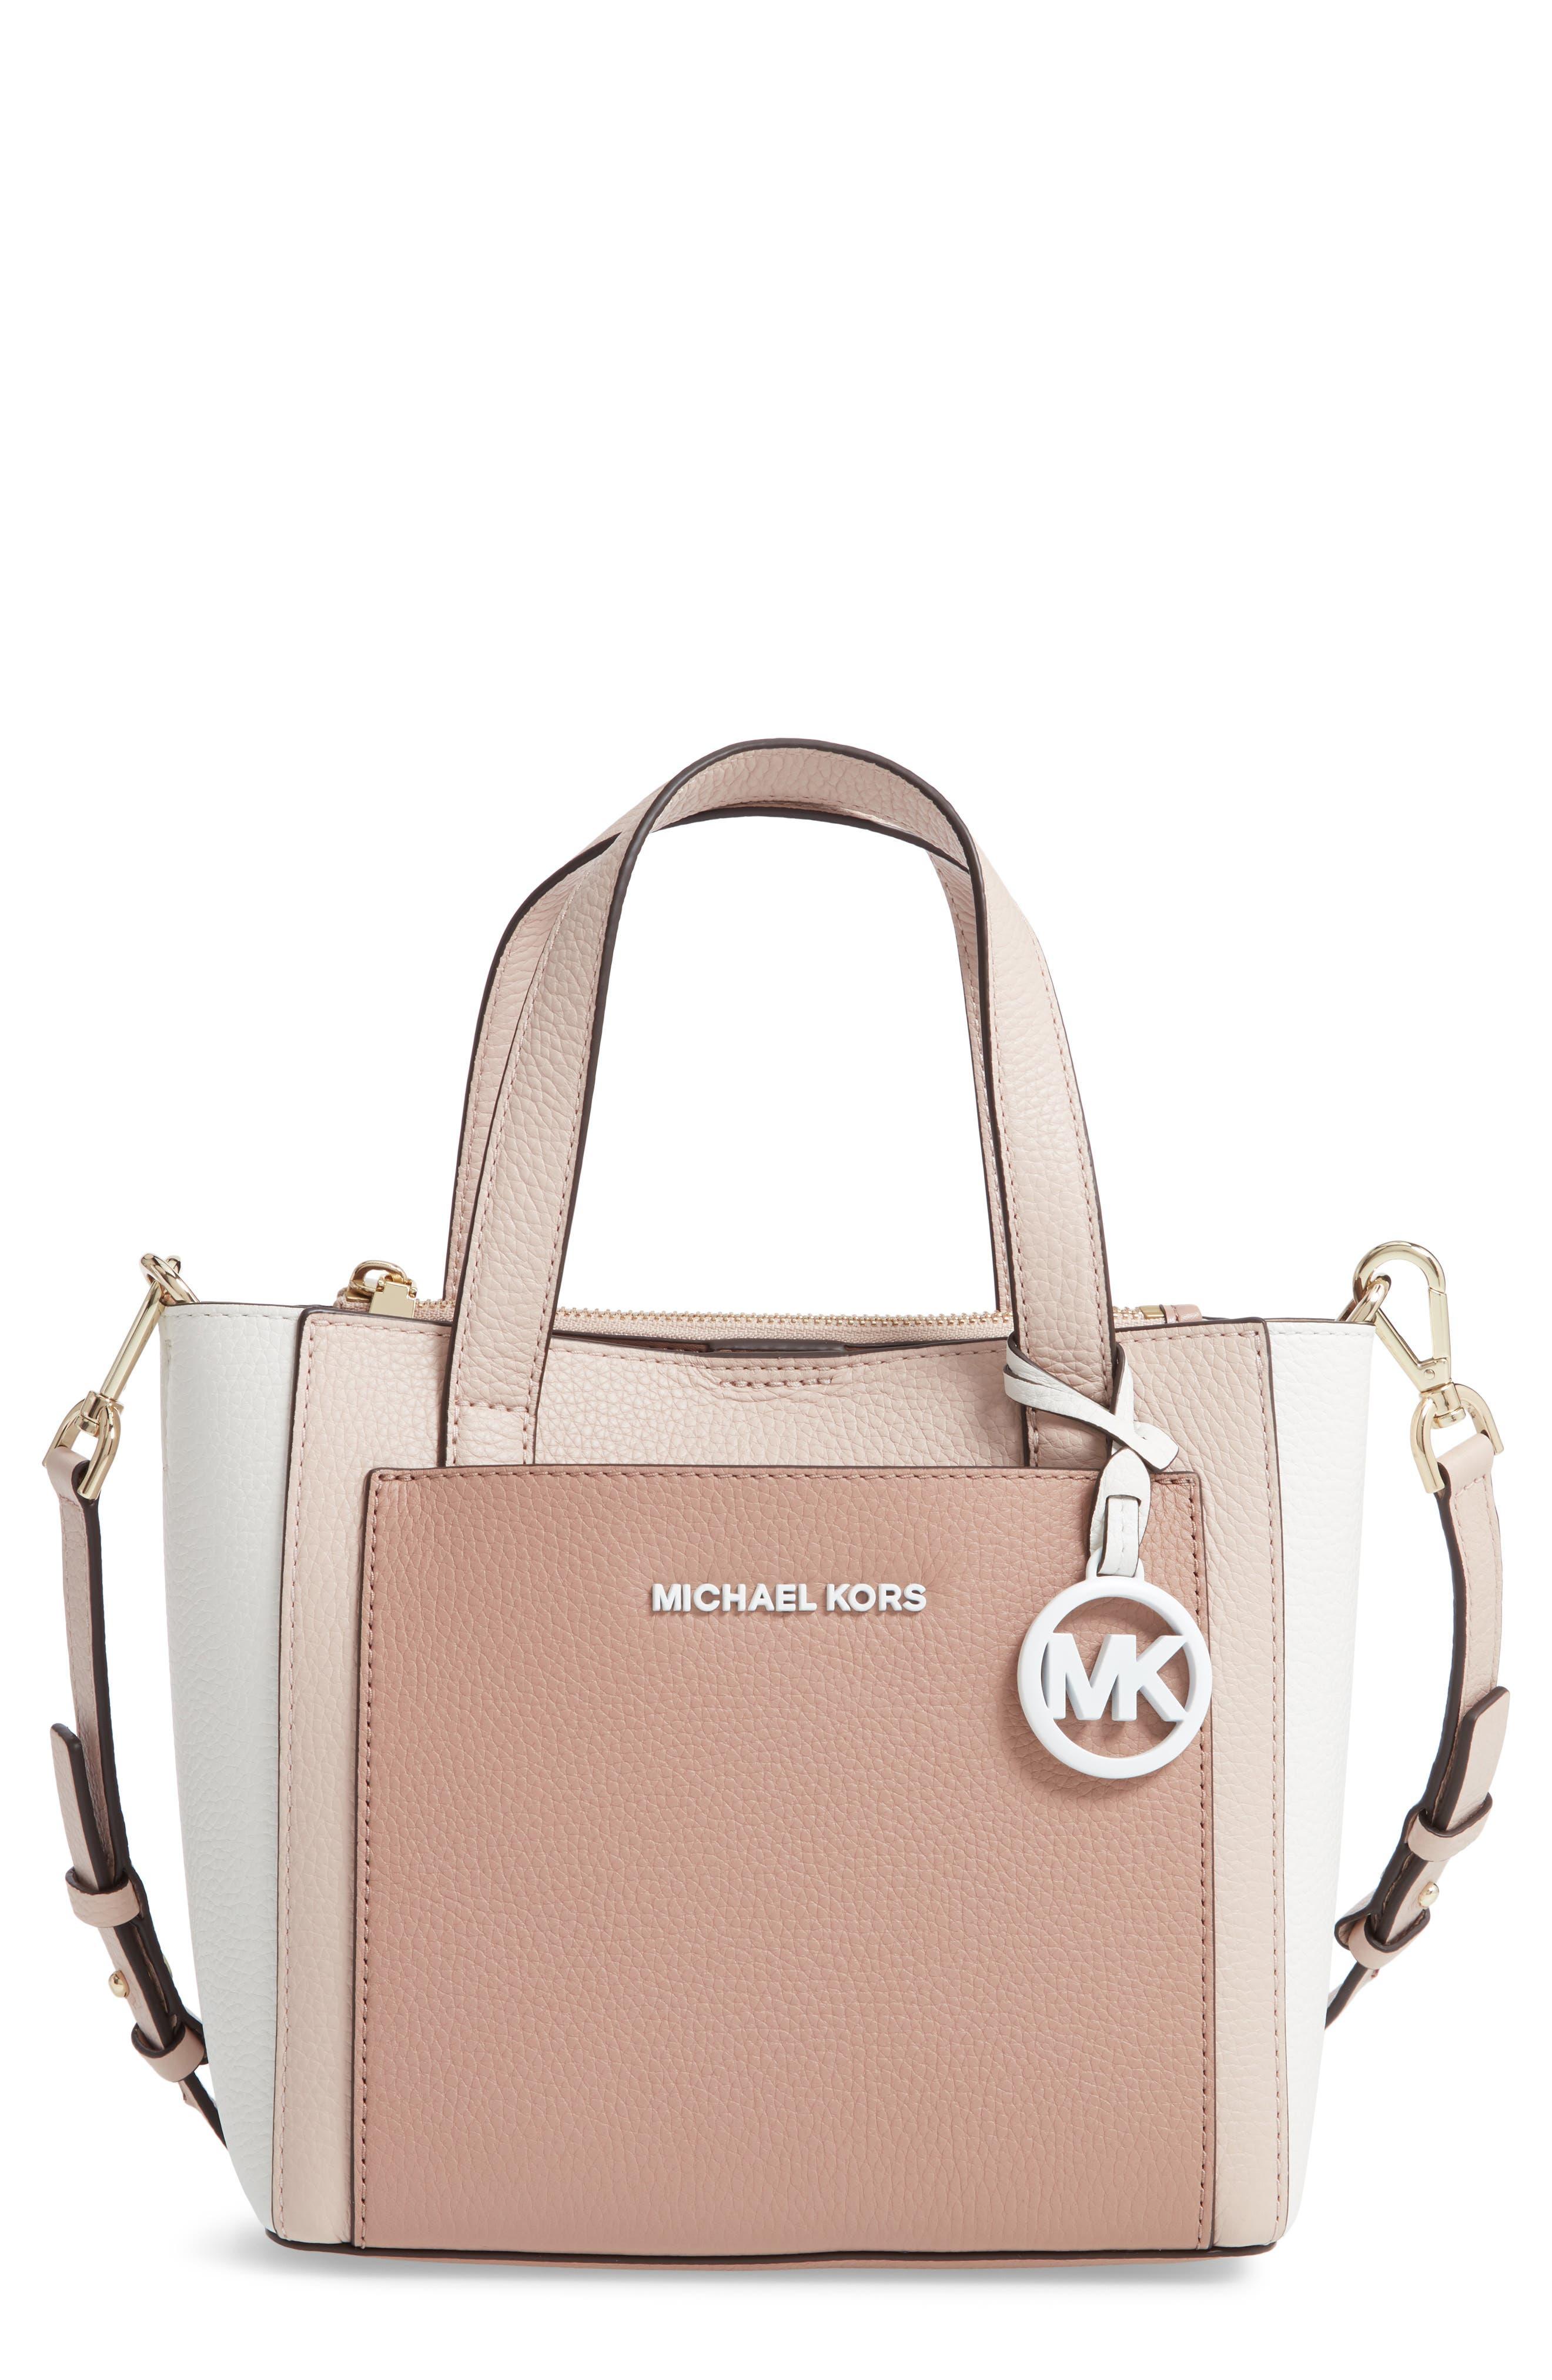 ceb3ac6afc0a michael kors handbags | Nordstrom